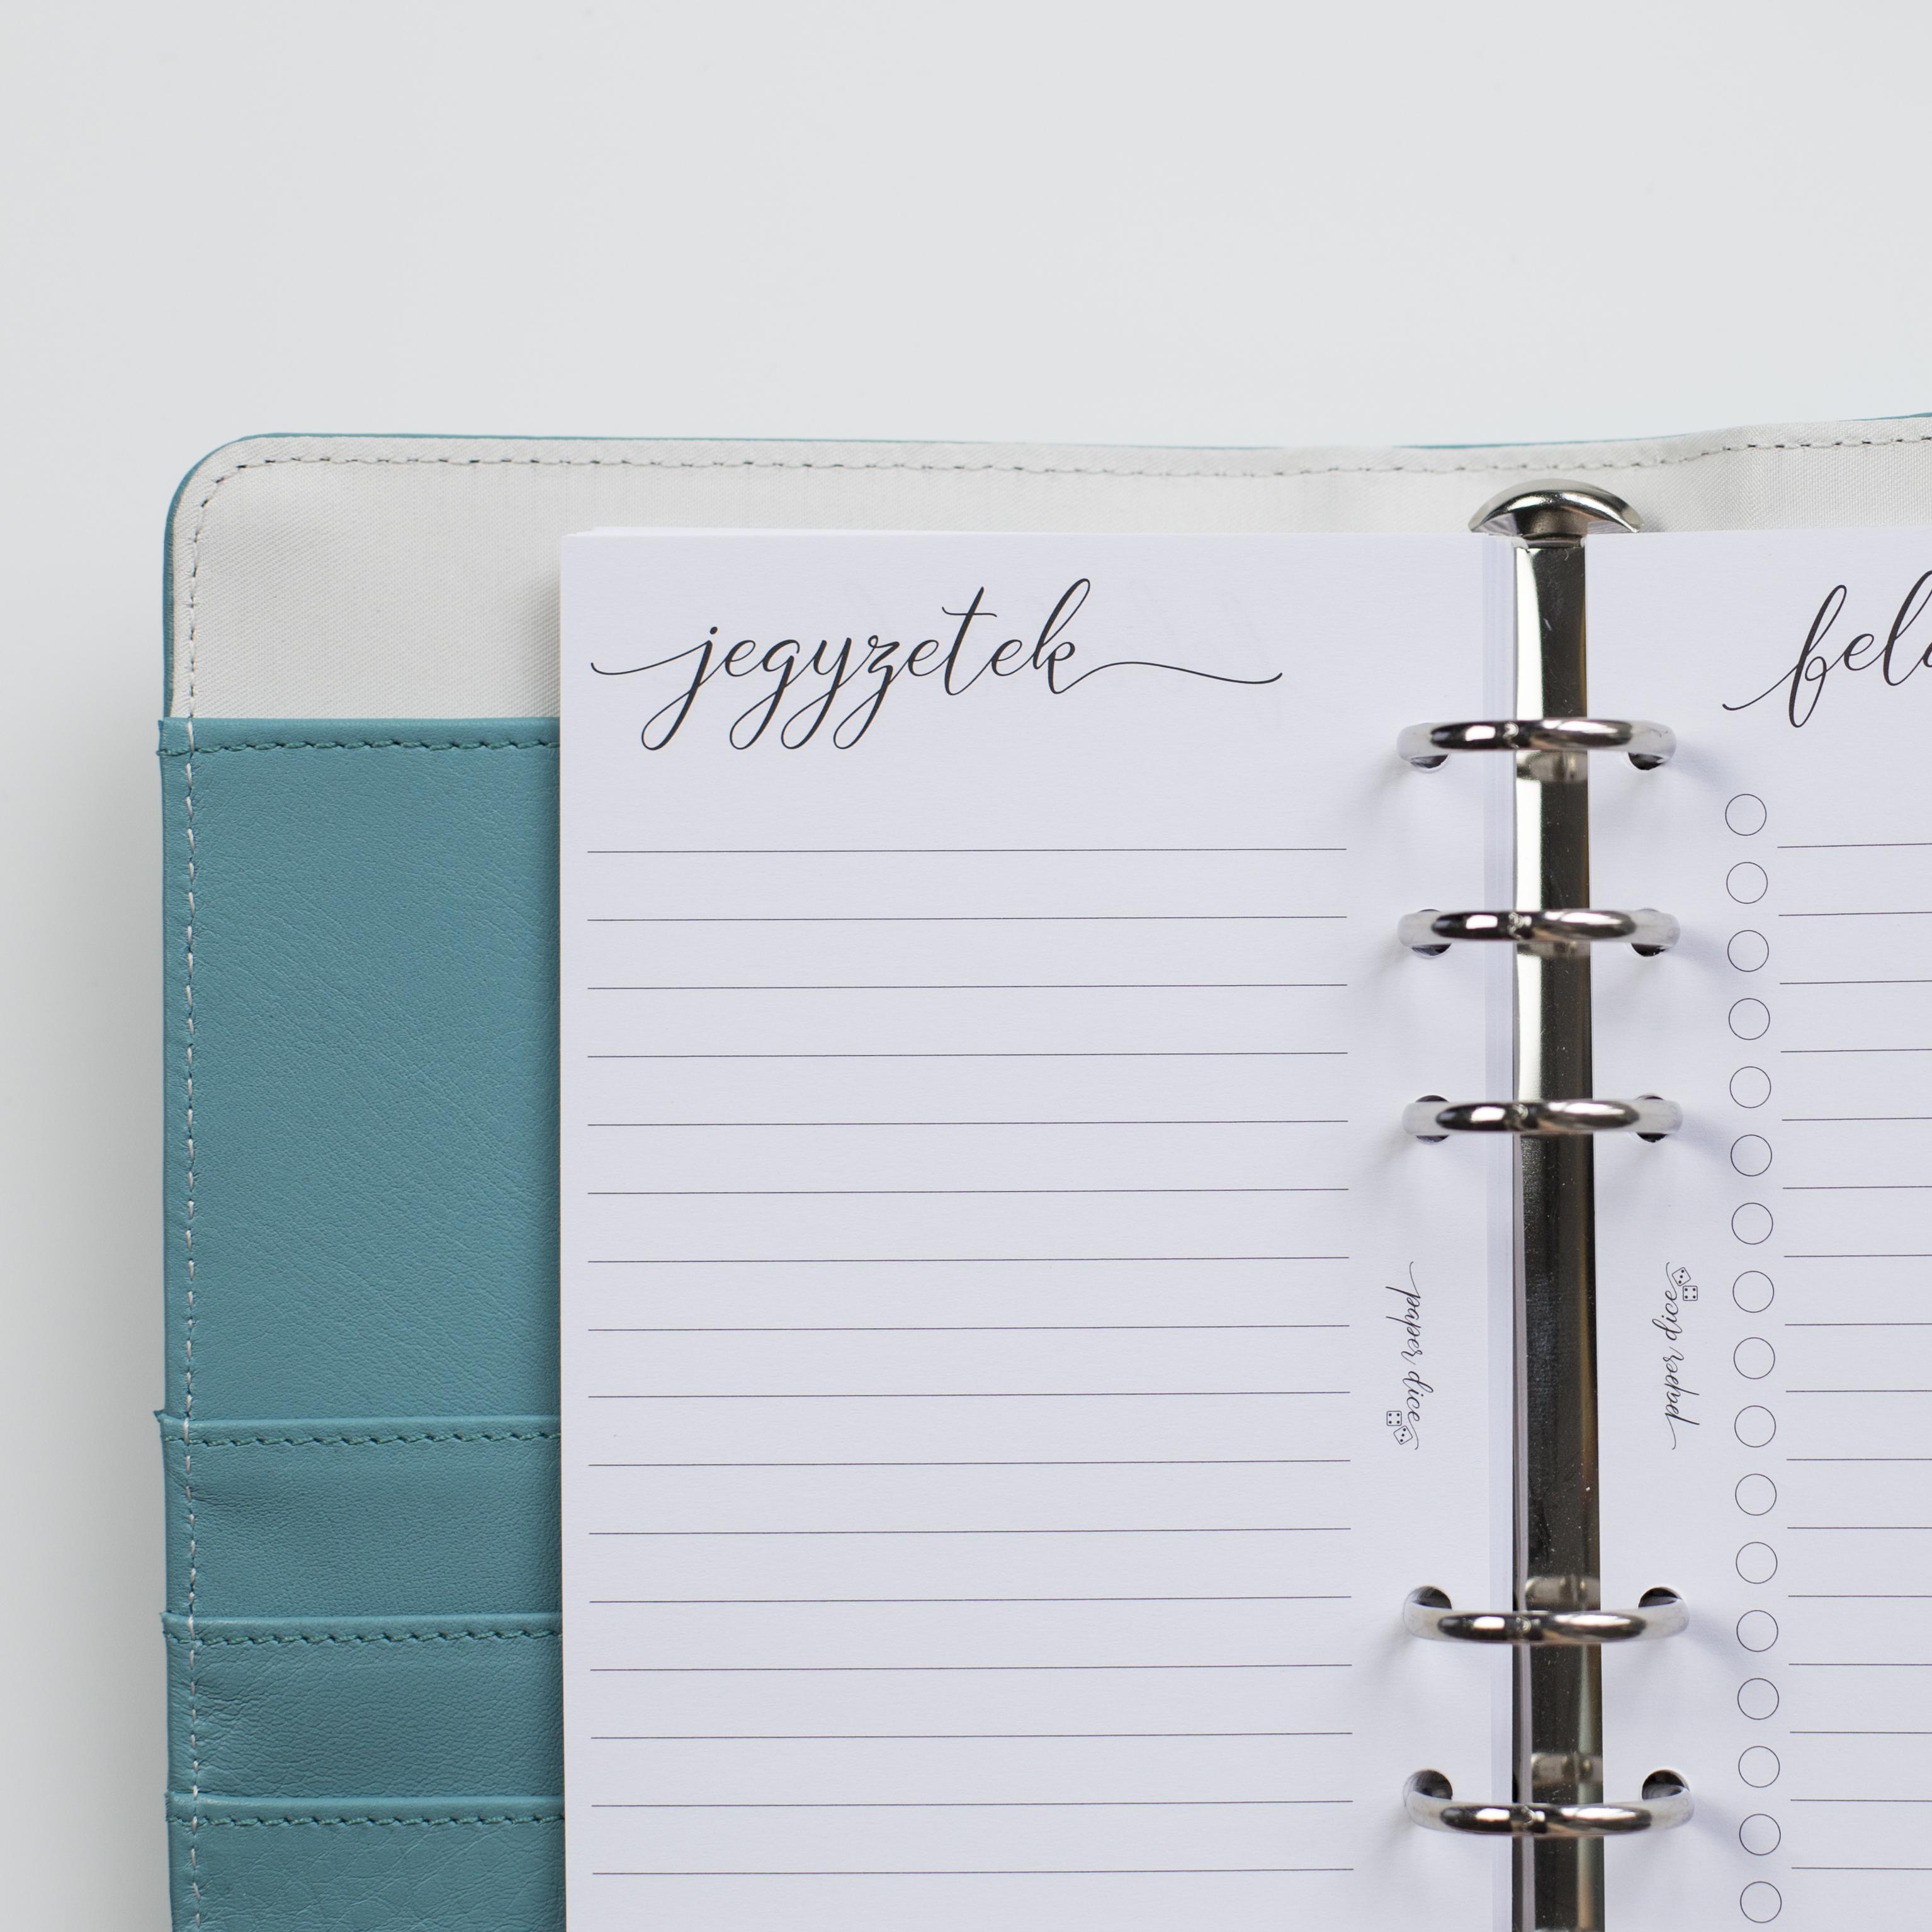 paperdiceplanner_türkiz_9